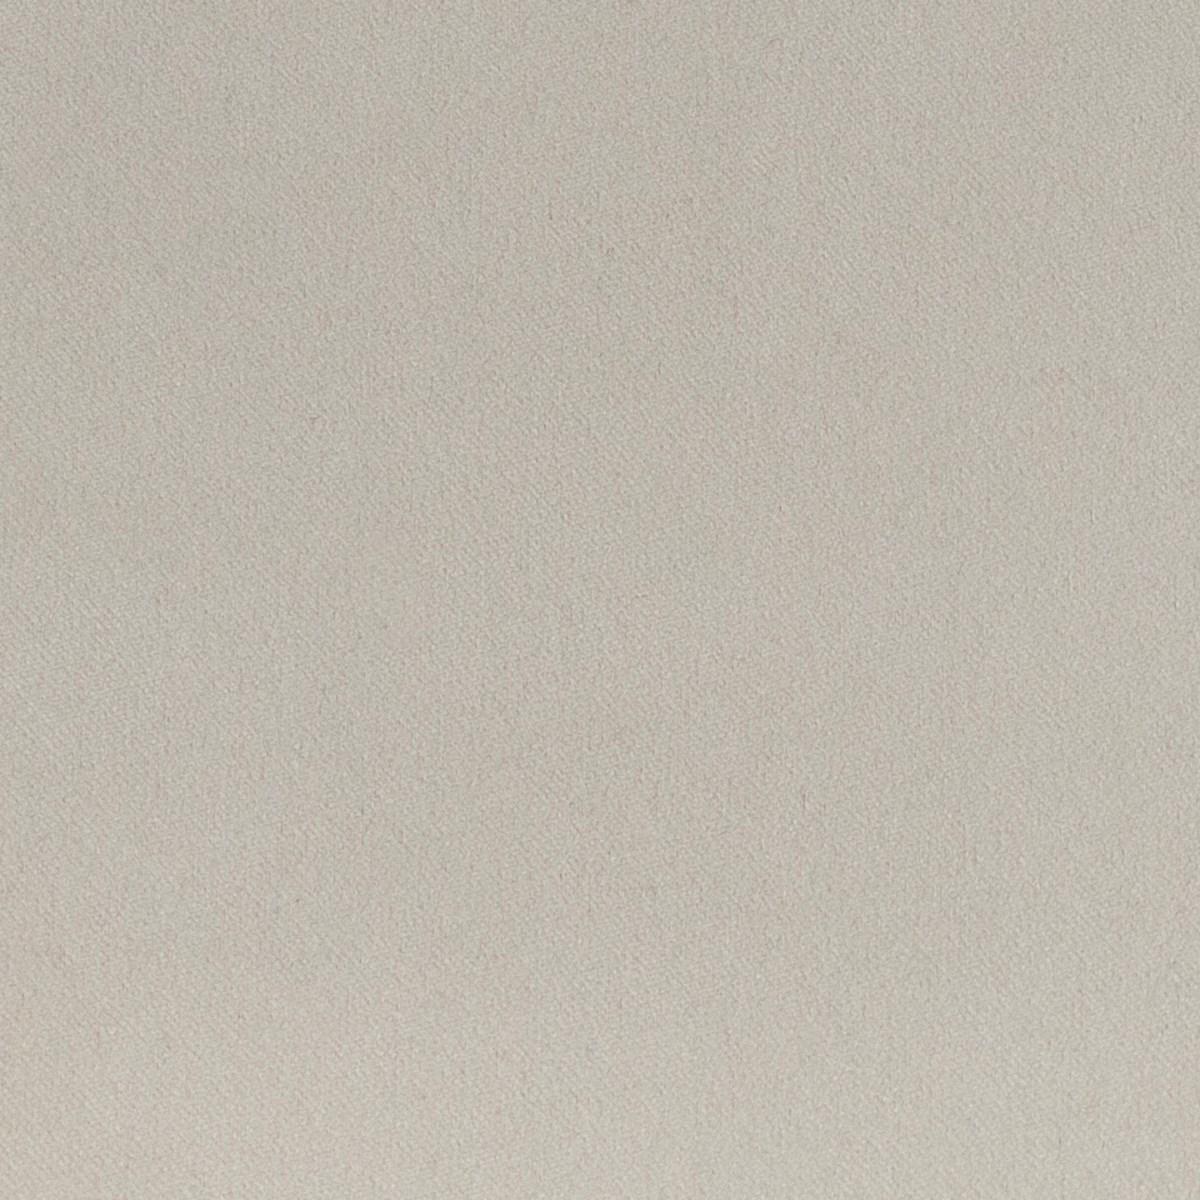 Verona Sofa 245 - Challenger